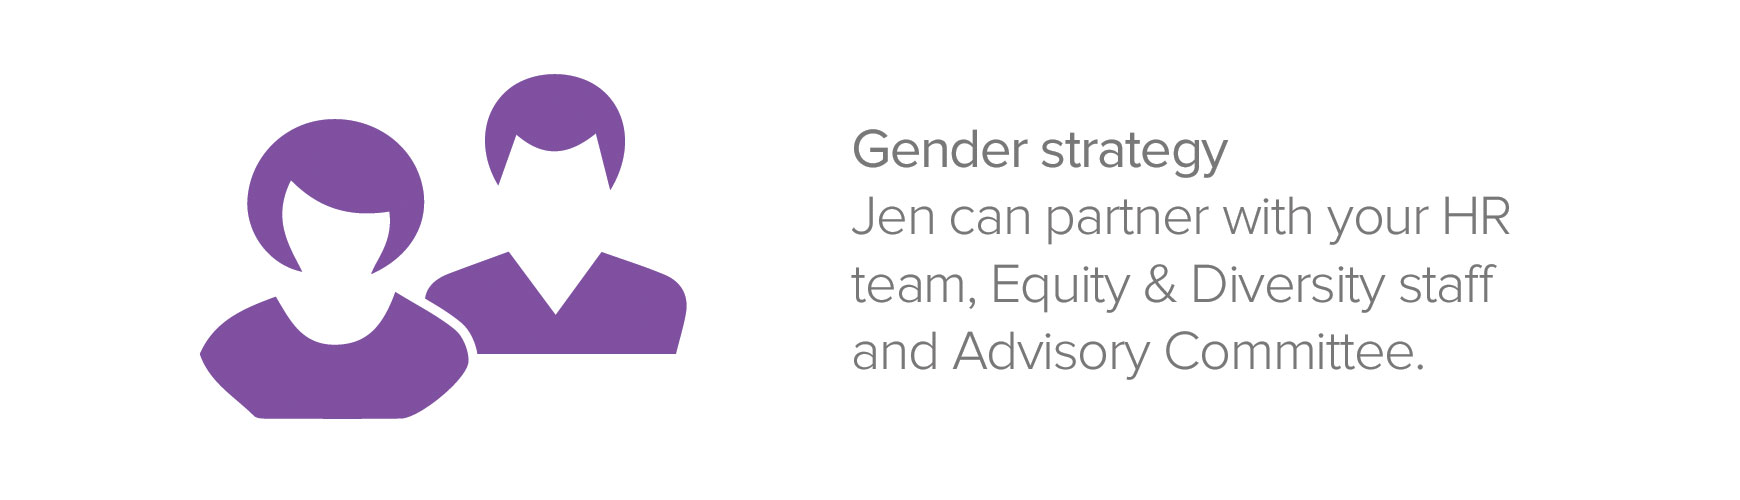 Gender-Strategy-v2.jpg